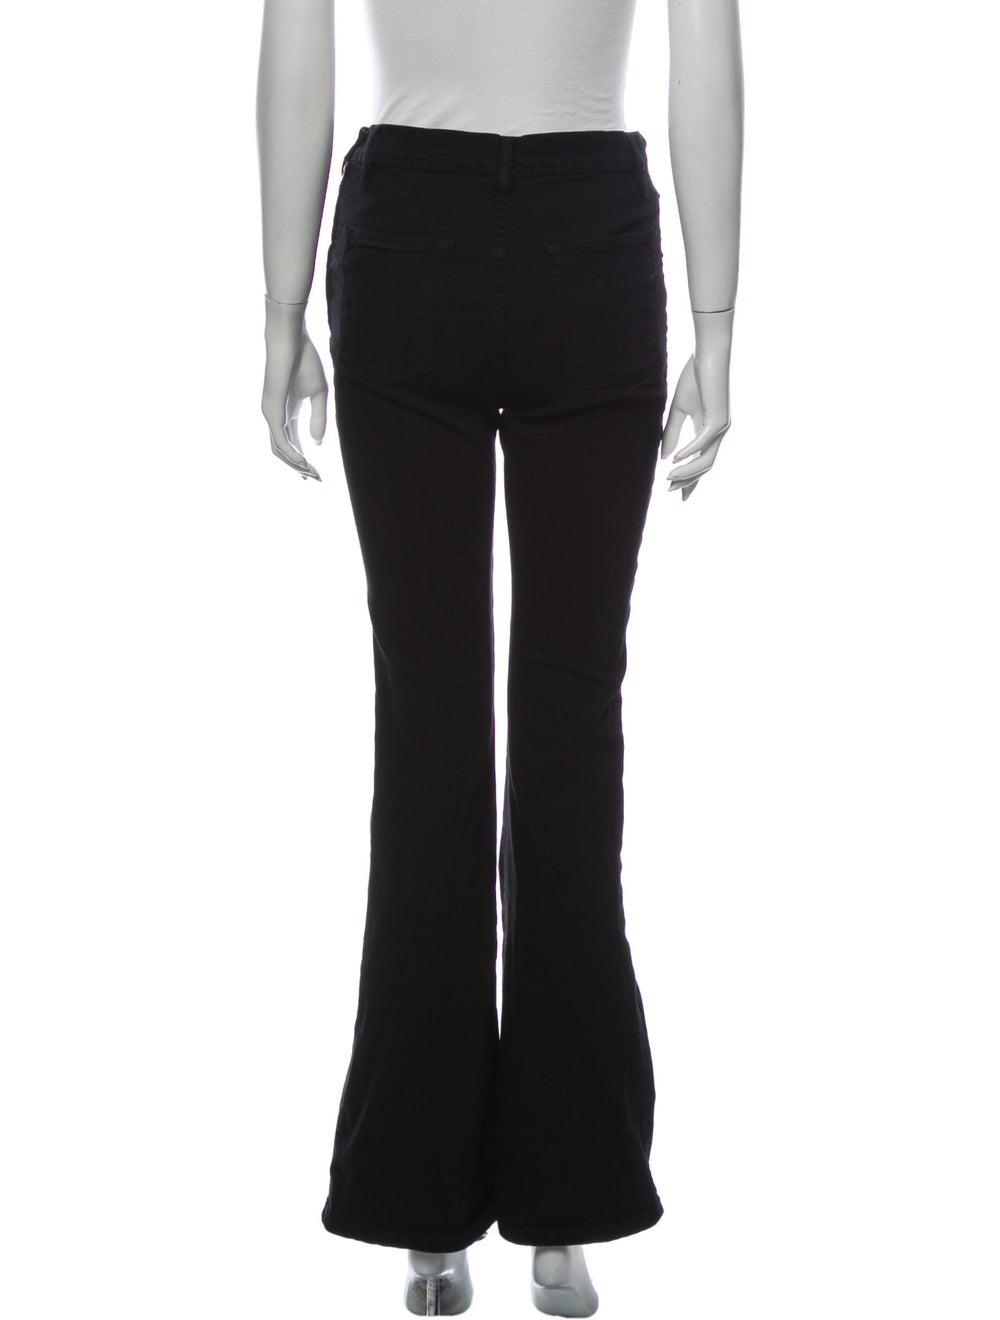 Frame High-Rise Flared Jeans Black - image 3